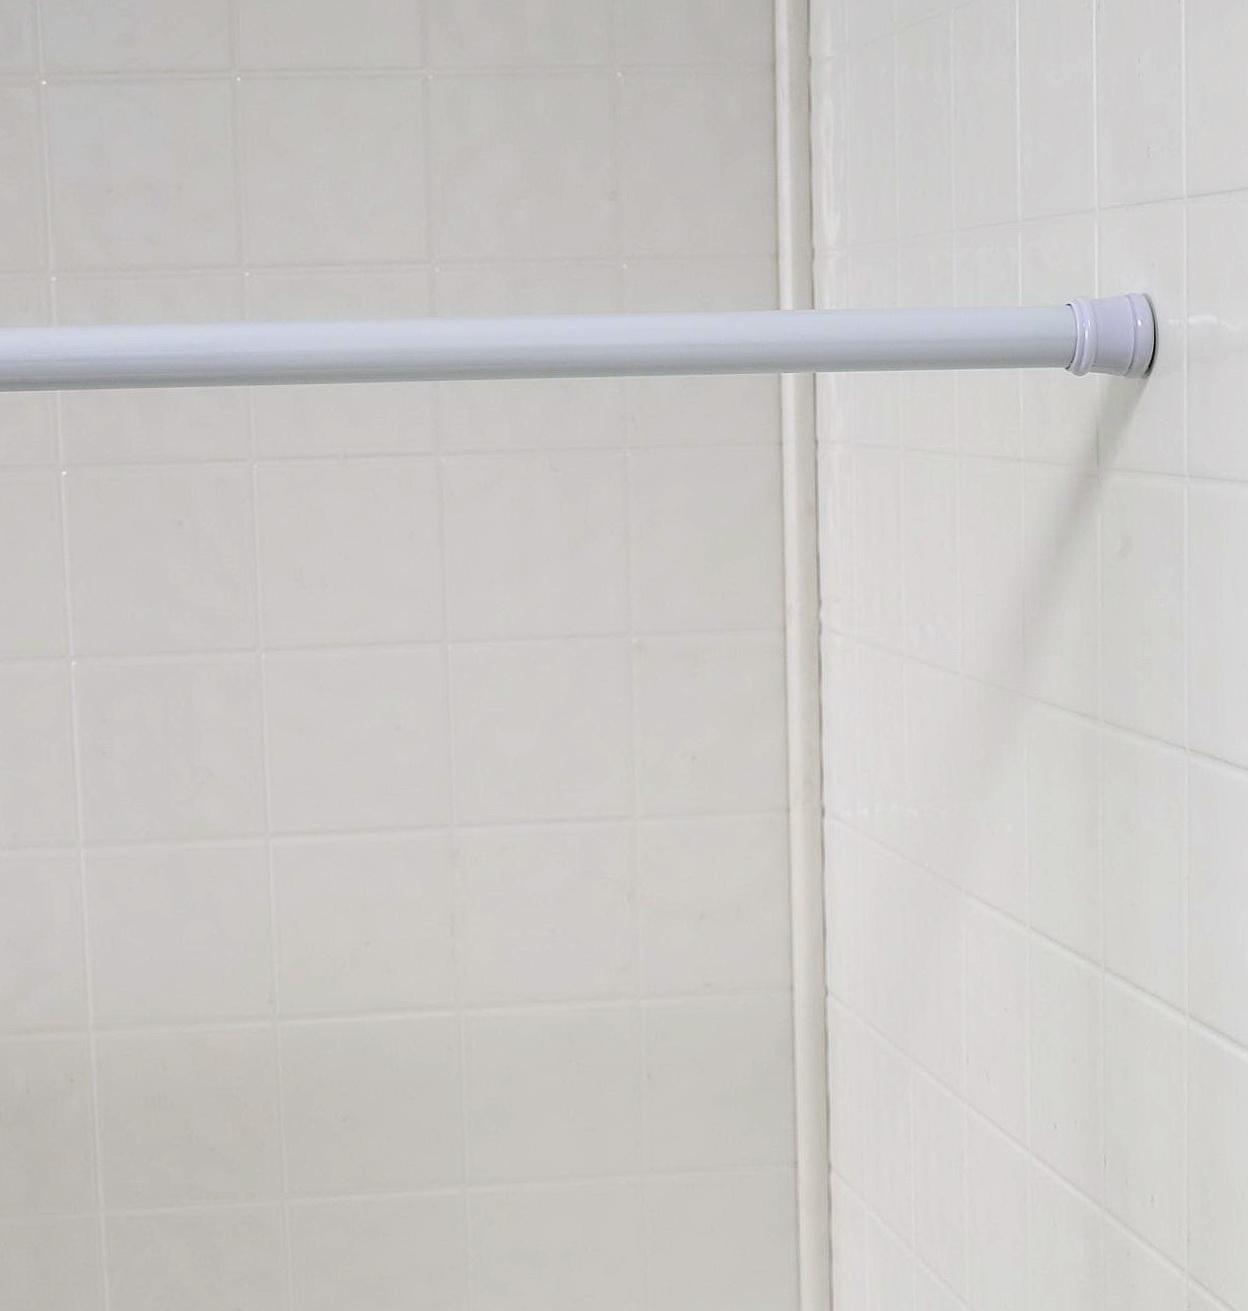 White Curtain Rods Walmart